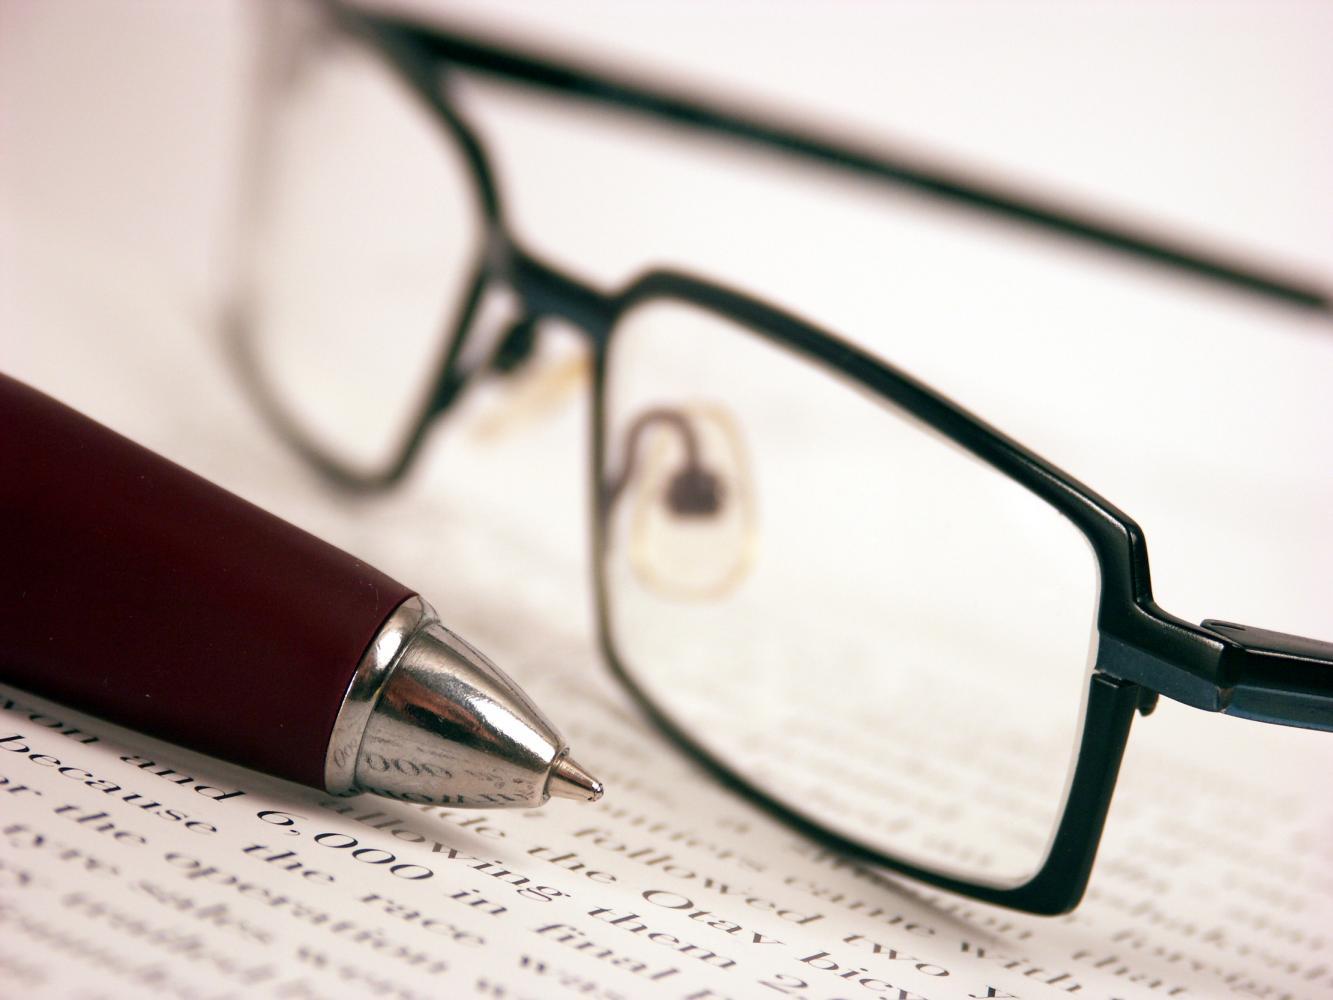 Dissertation Services In Uk Online